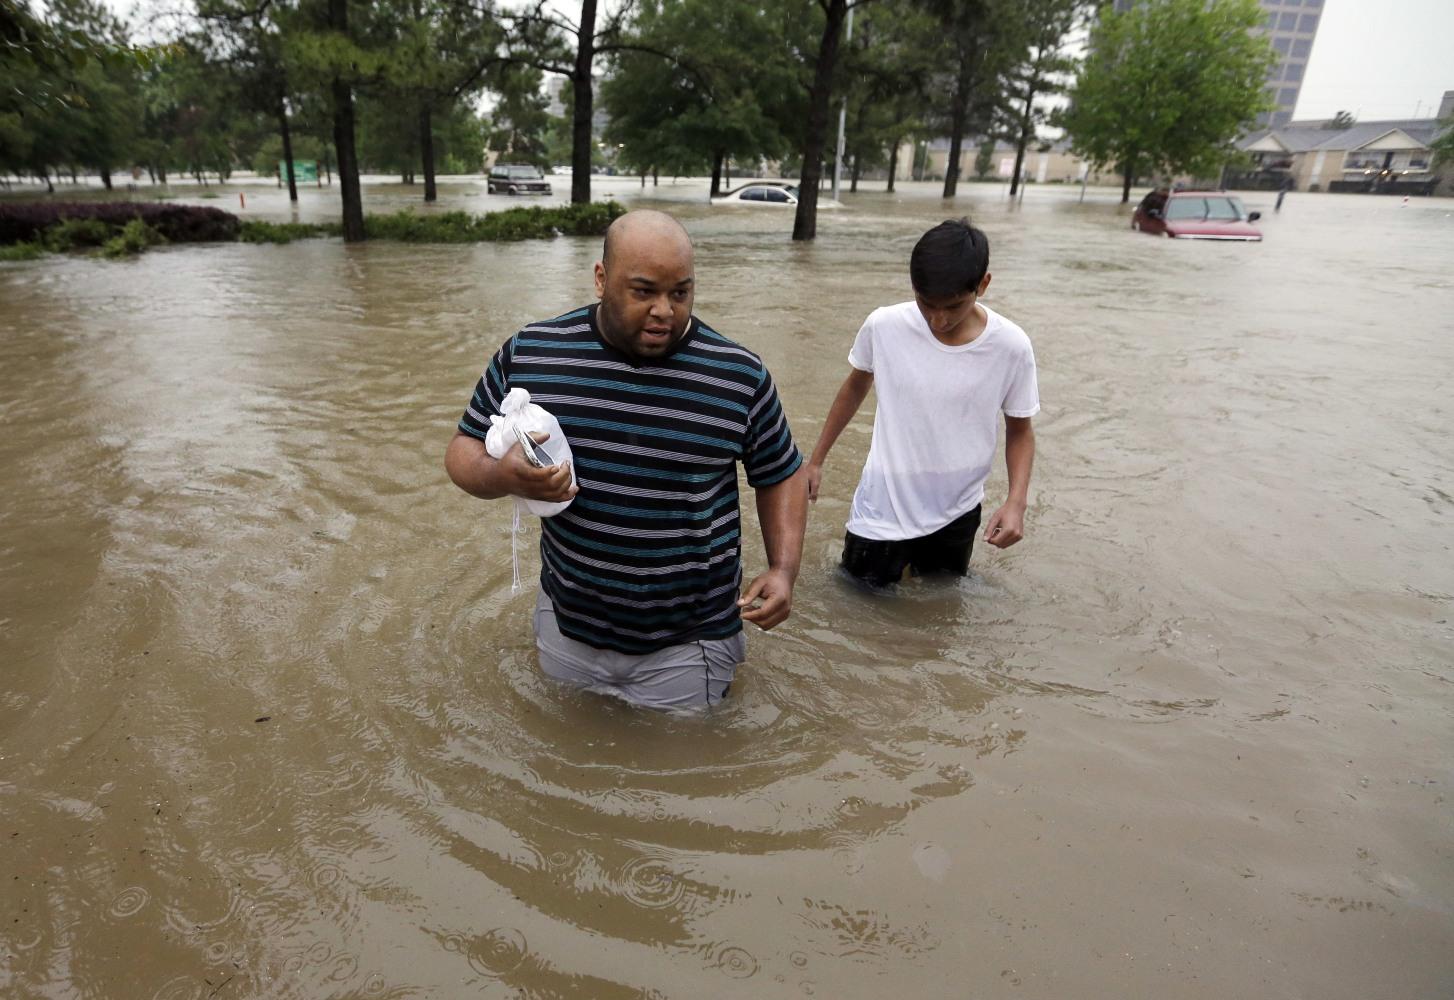 'Unprecedented': 5 Dead as Record Rainfall Floods Houston ...